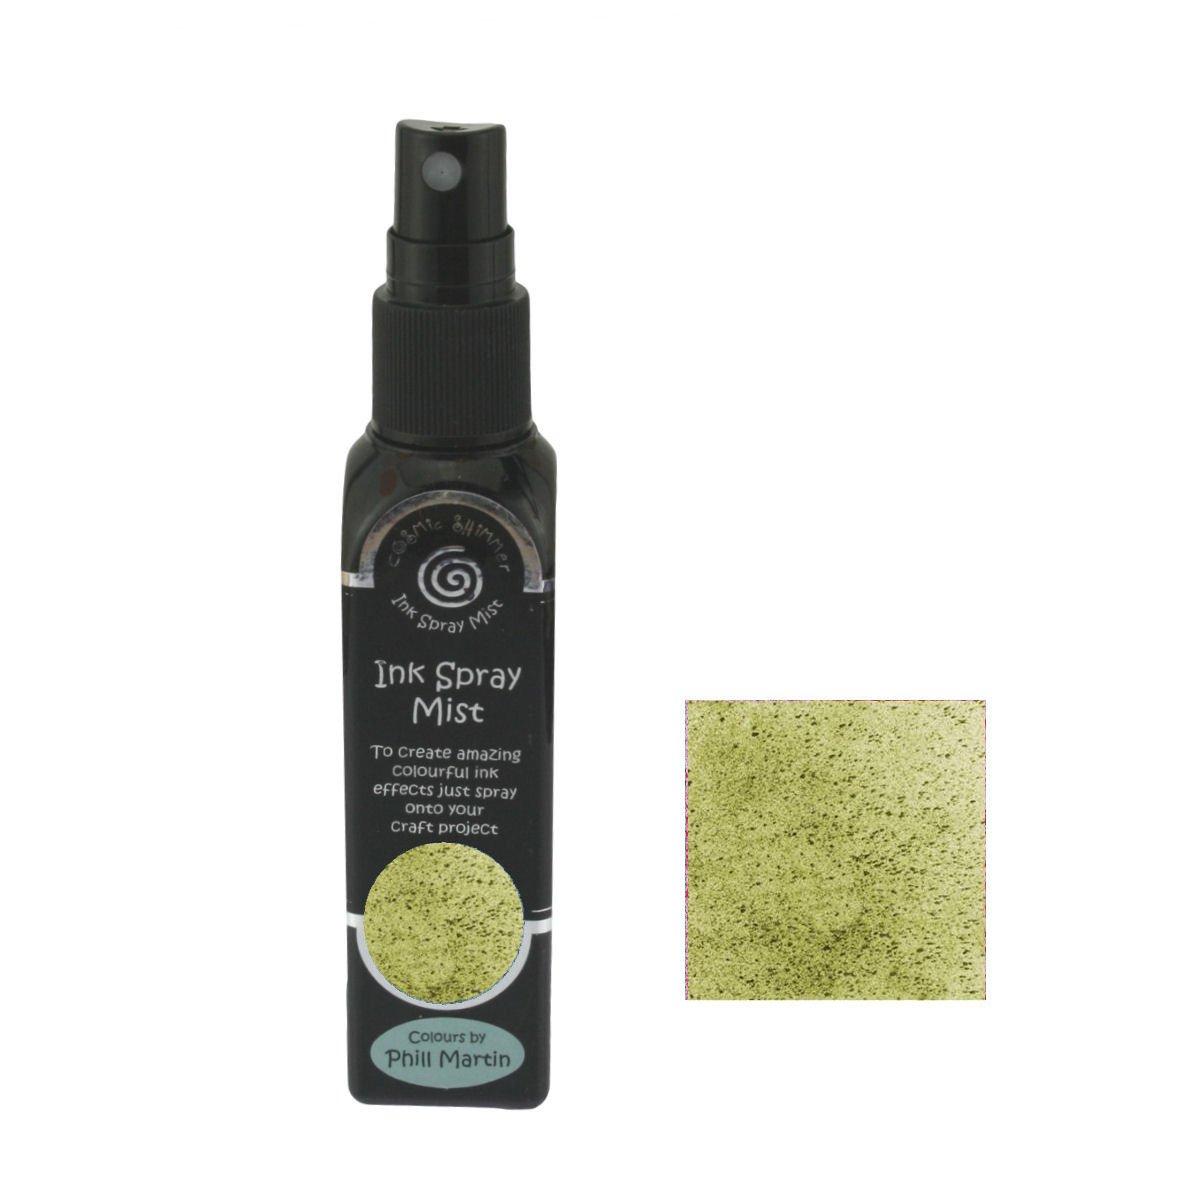 Cosmic Shimmer Ink Spray Mist 50ml - Chic Moss